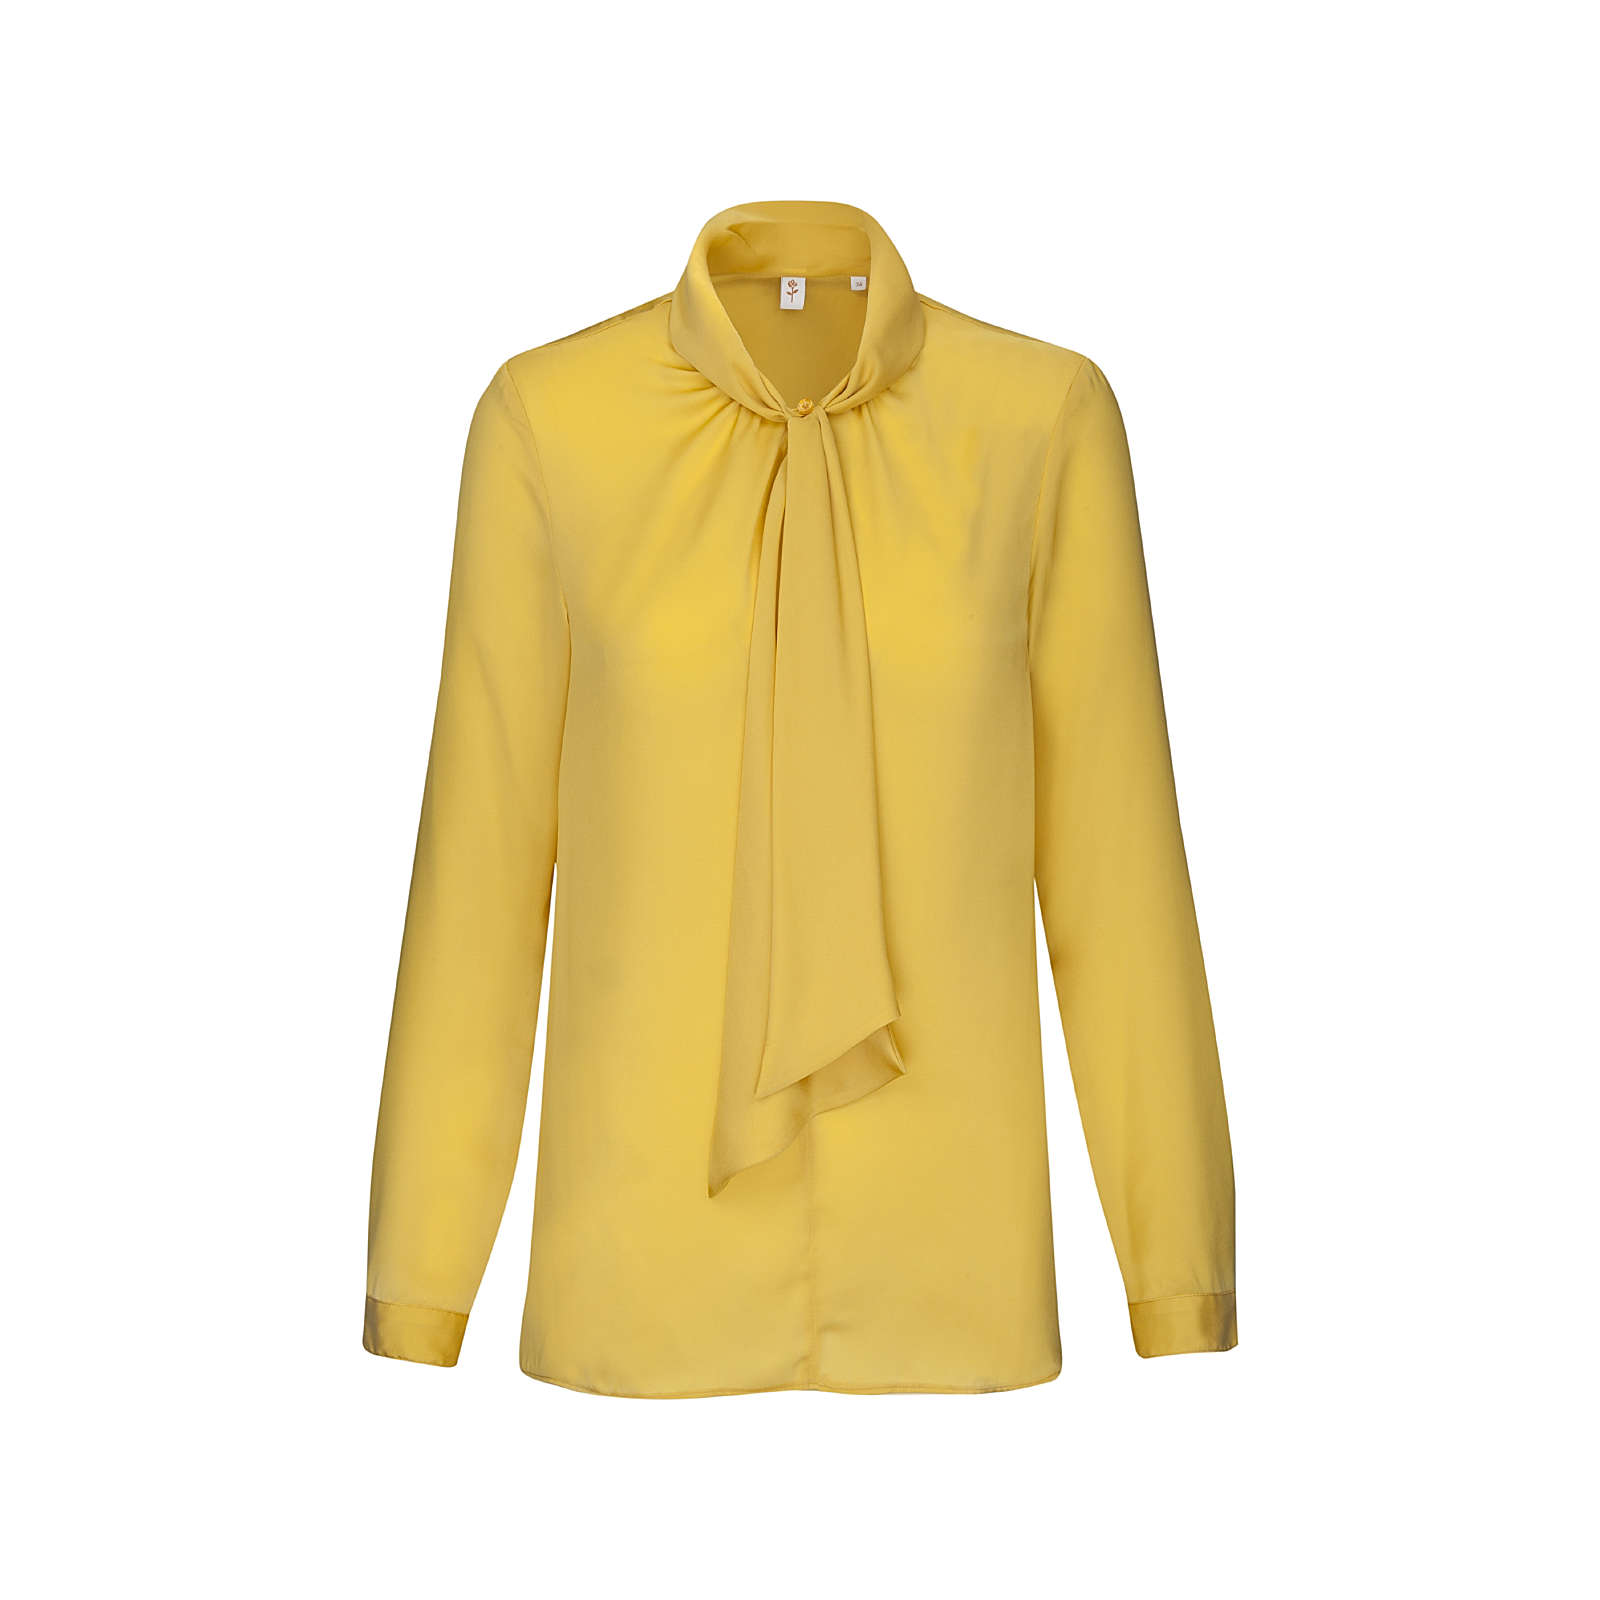 Seidensticker Schluppenbluse Langarm Uni Langarmblusen gelb Damen Gr. 46